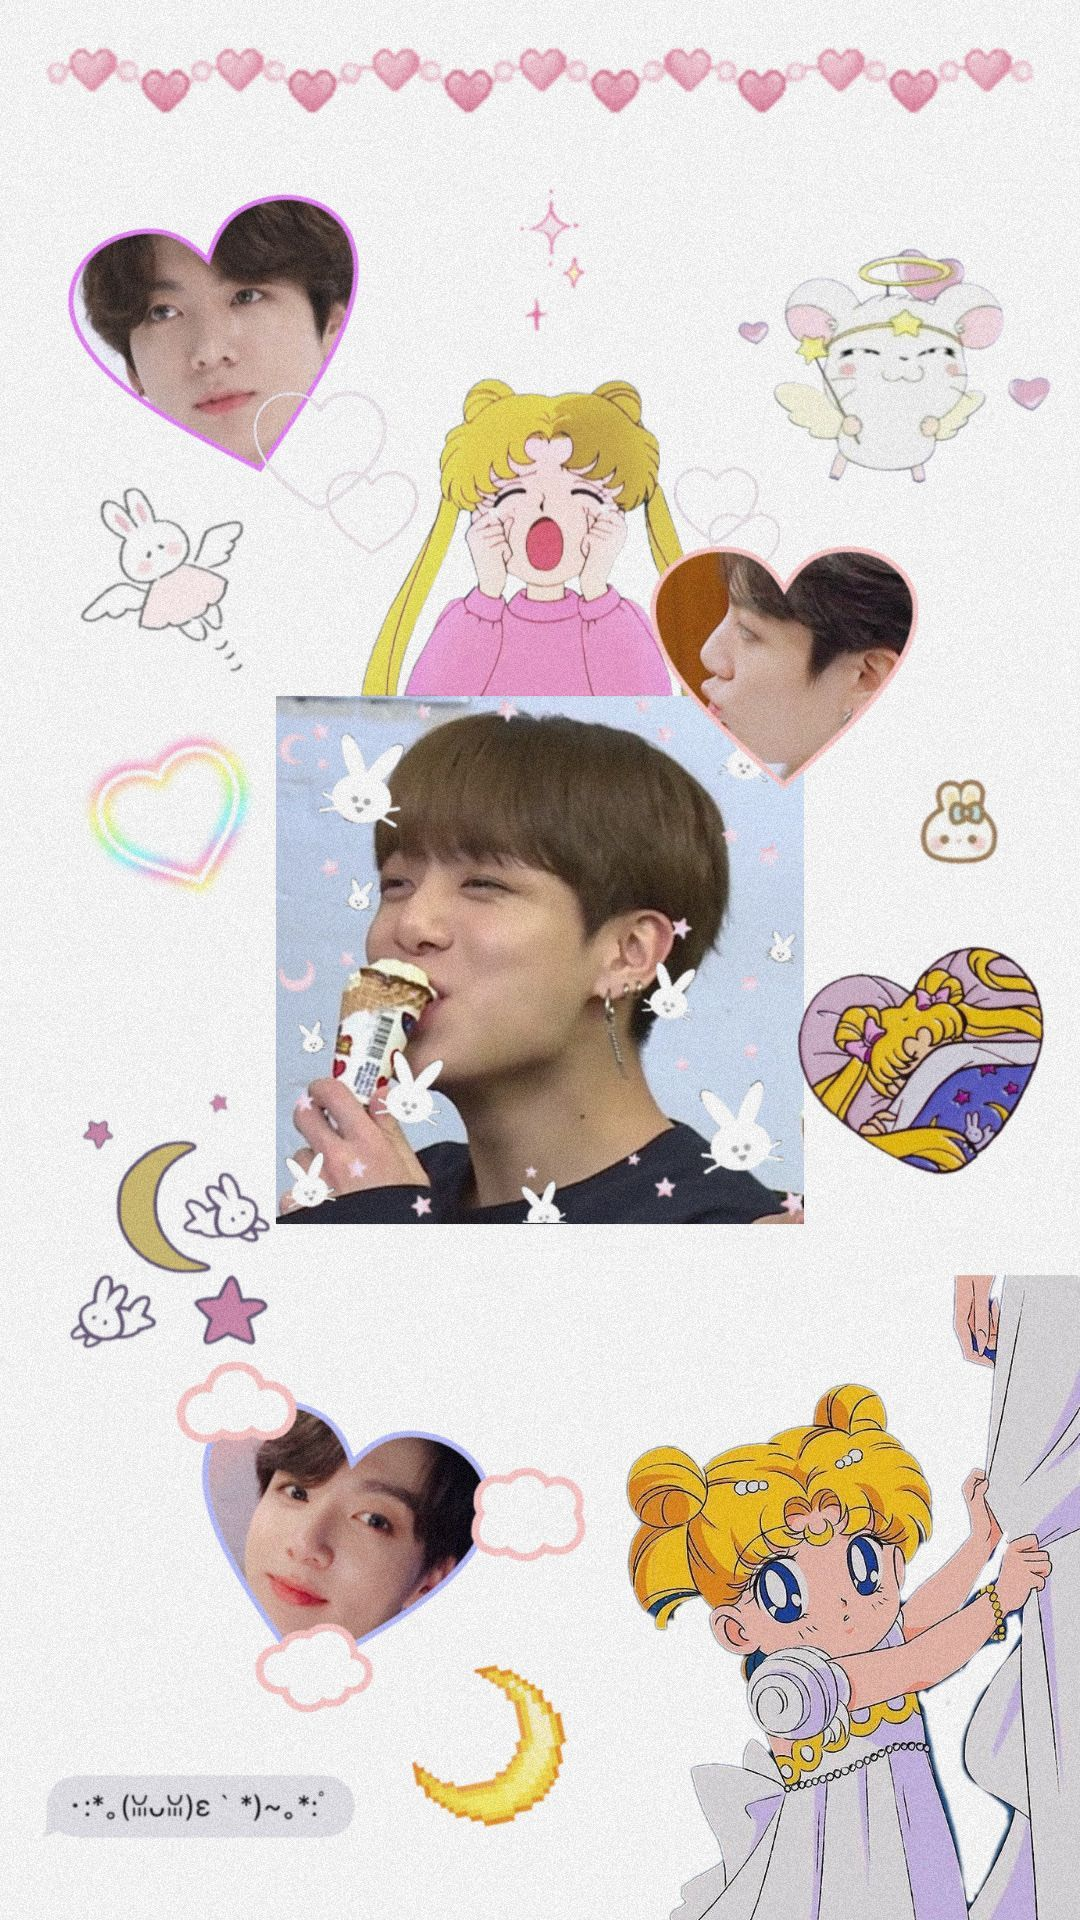 Bts Wallpapers Iphone Wallpaper Bts Bts Wallpaper Sailor Moon Wallpaper Cute bts wallpaper iphone